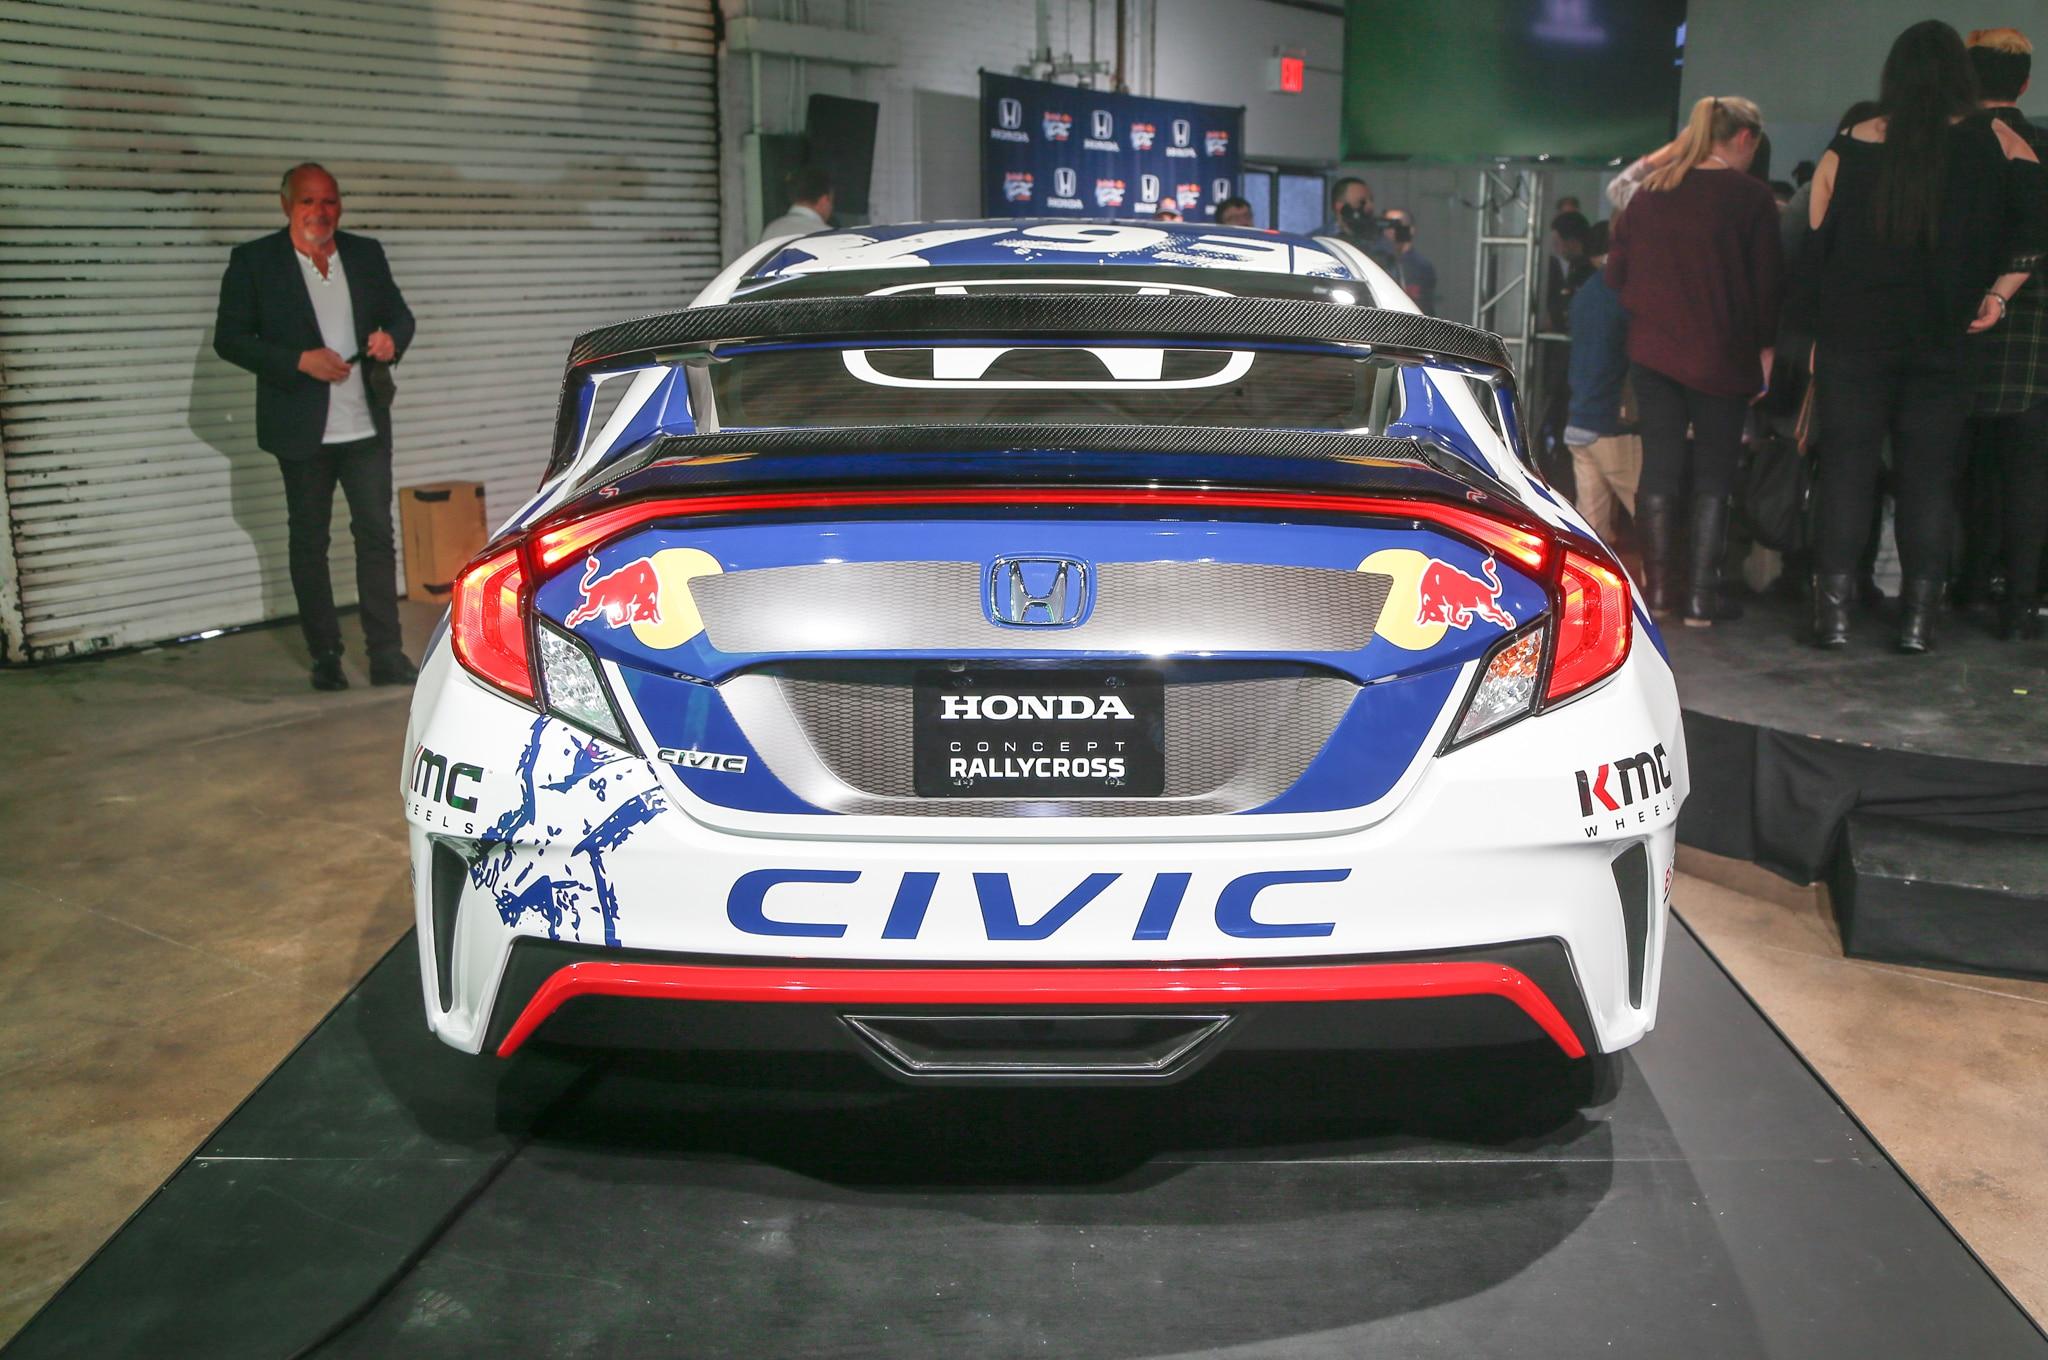 2016 honda civic coupe red bull global rallycross race car debuts in - Unlike